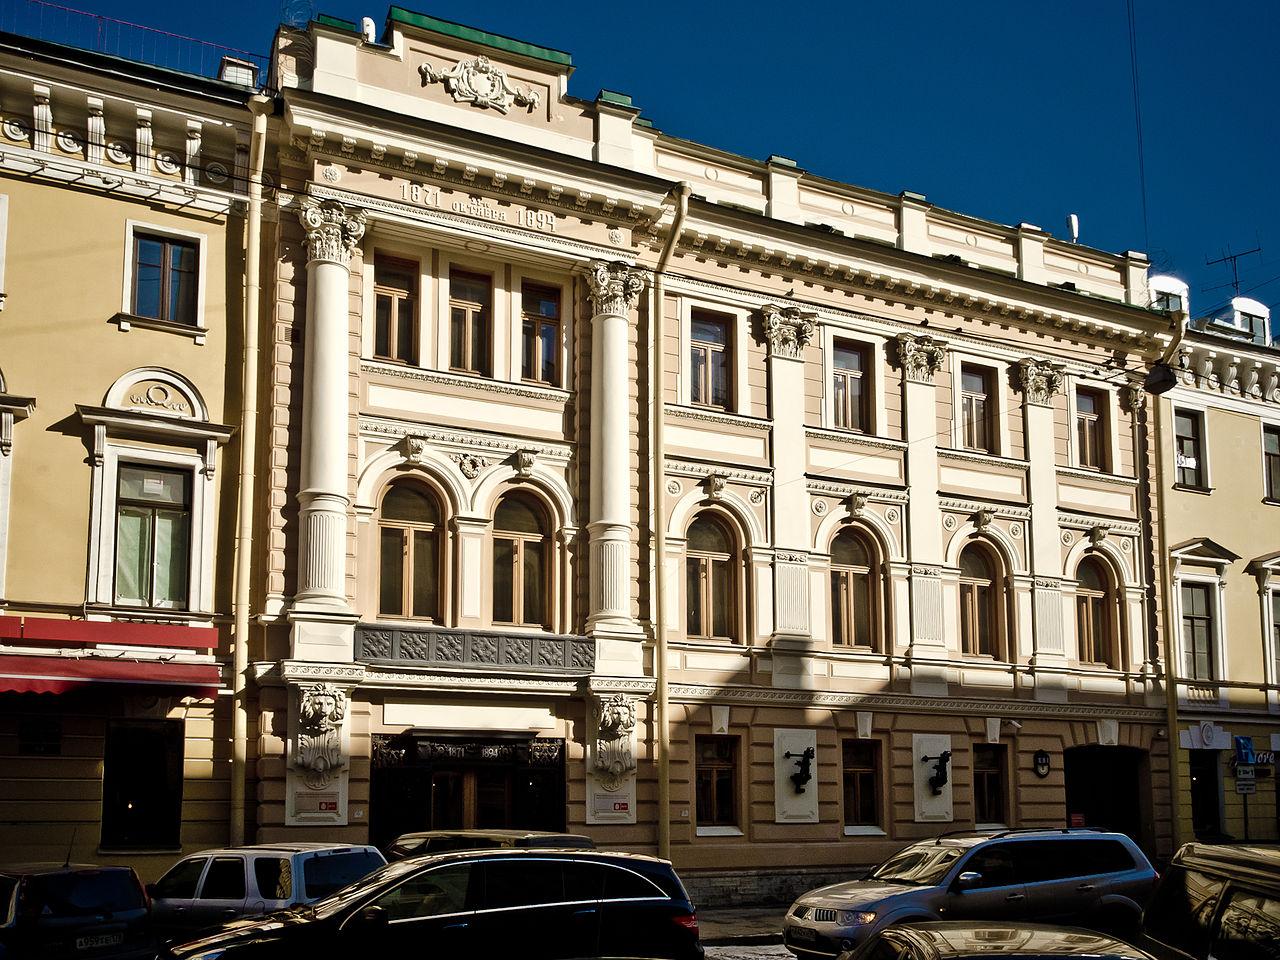 Здание Общества взаимного кредита уездного земства. Фото: Florstein (Wikimedia Commons)